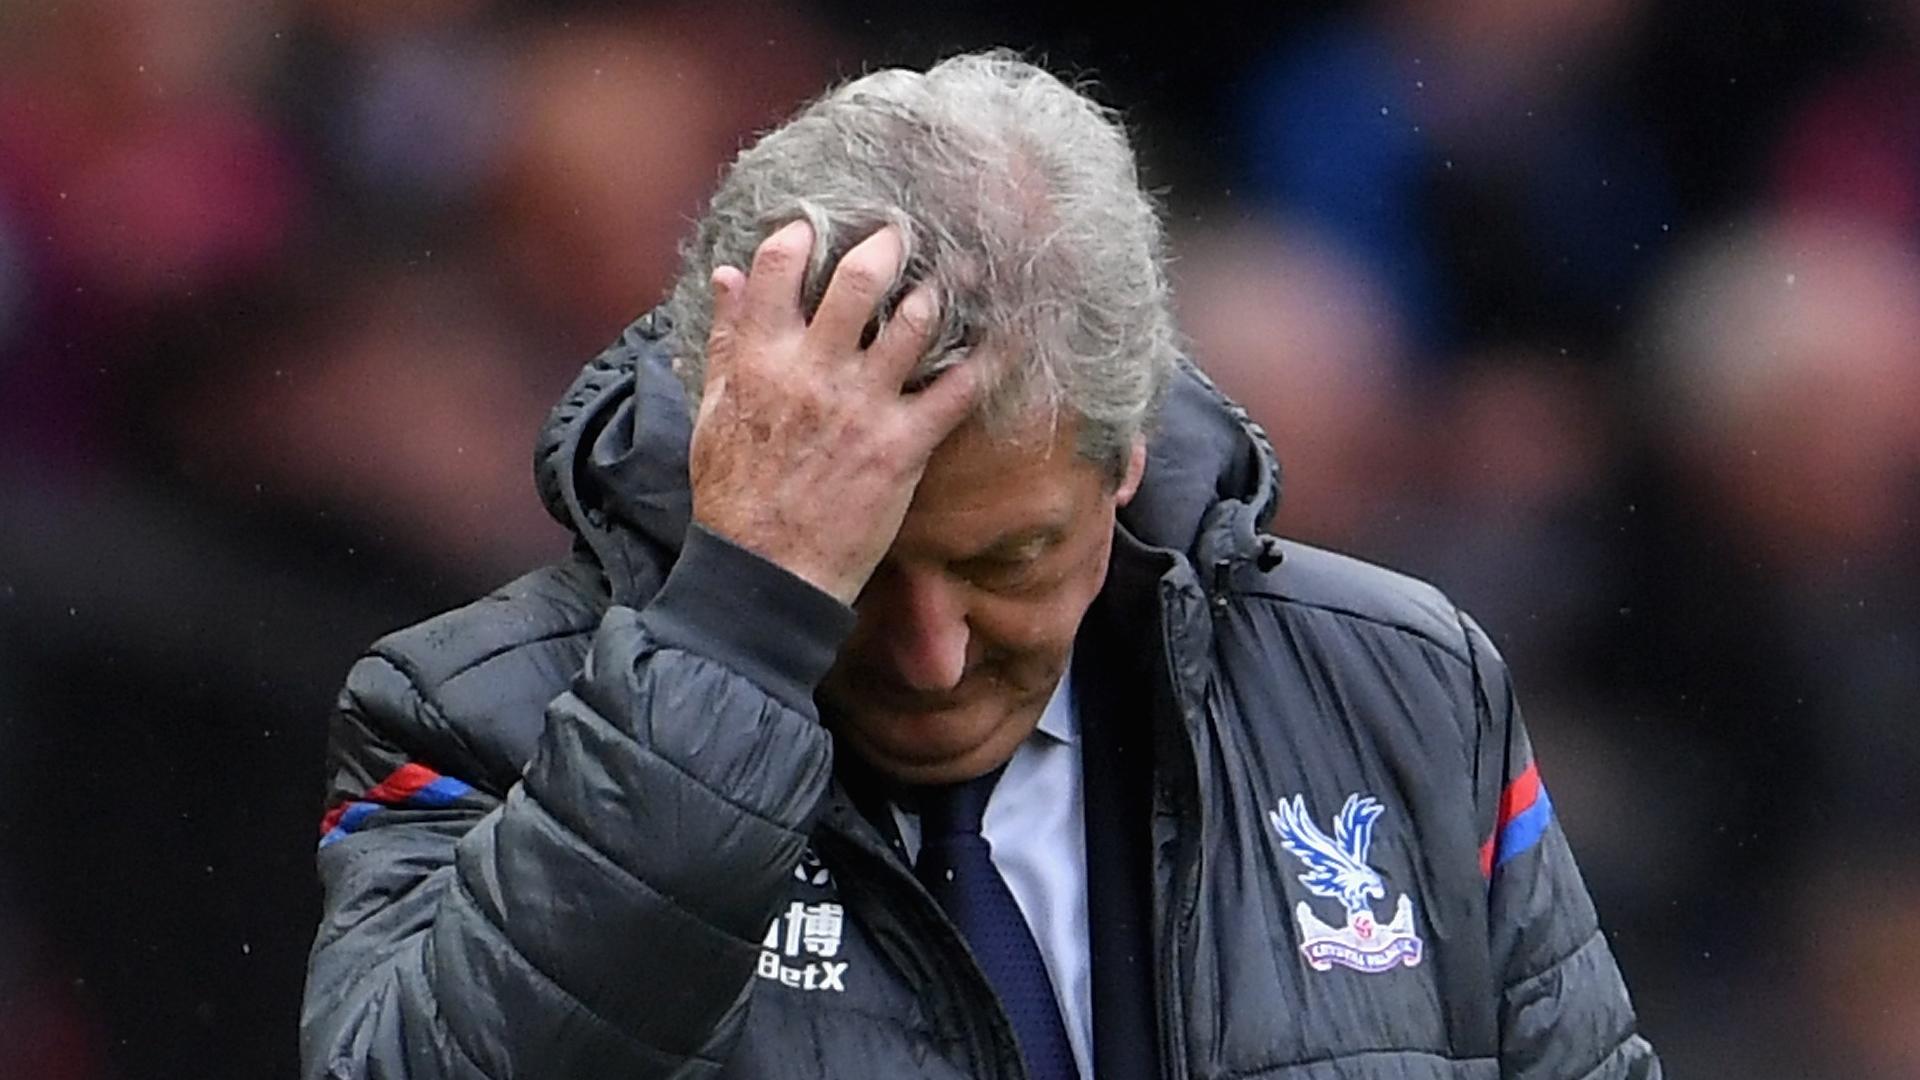 'Paris Saint-Germain, Monaco and Borussia Dortmund keen on signing Wilfried Zaha'